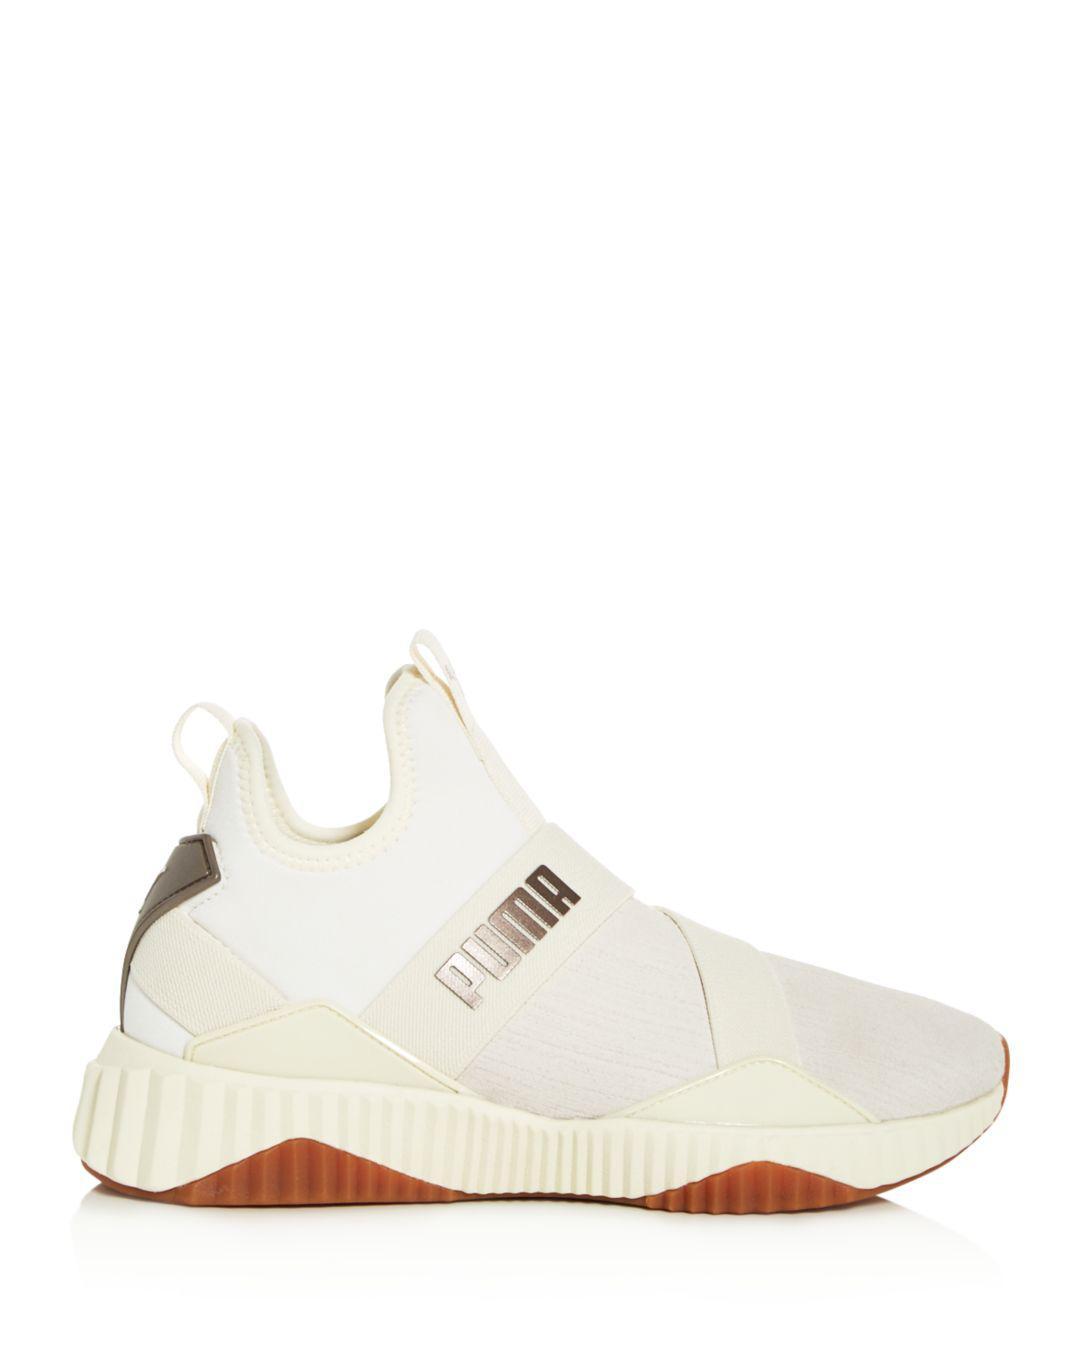 860e79025719 PUMA Women s Defy Luxe Mid-top Sneakers in White - Lyst